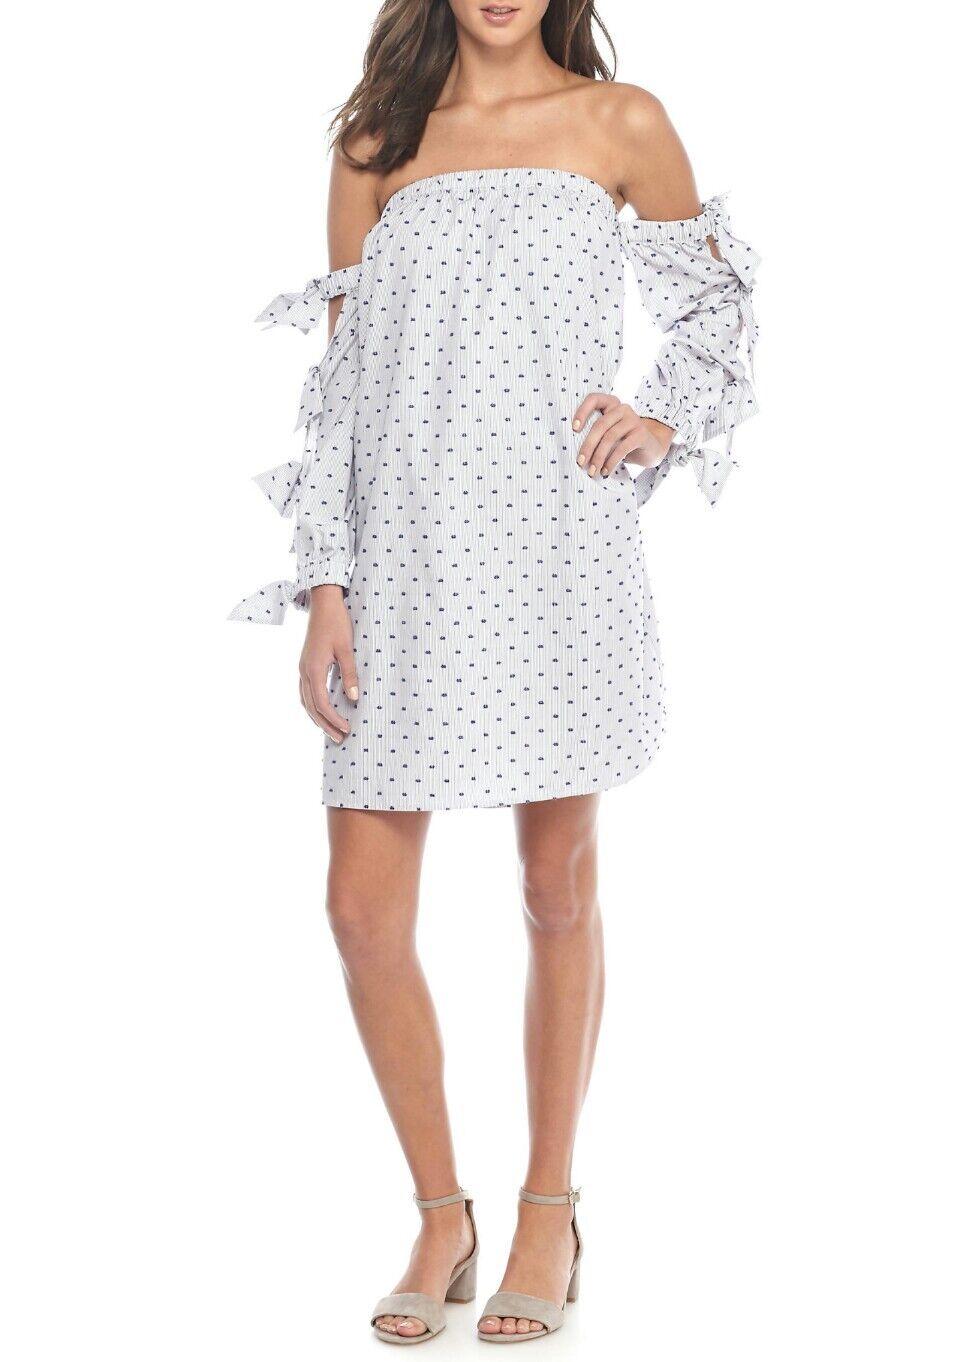 Cece damen Größe 8,10,12,14 Tie Sleeve Off Shoulder Striped Mini Dress Nordstrom